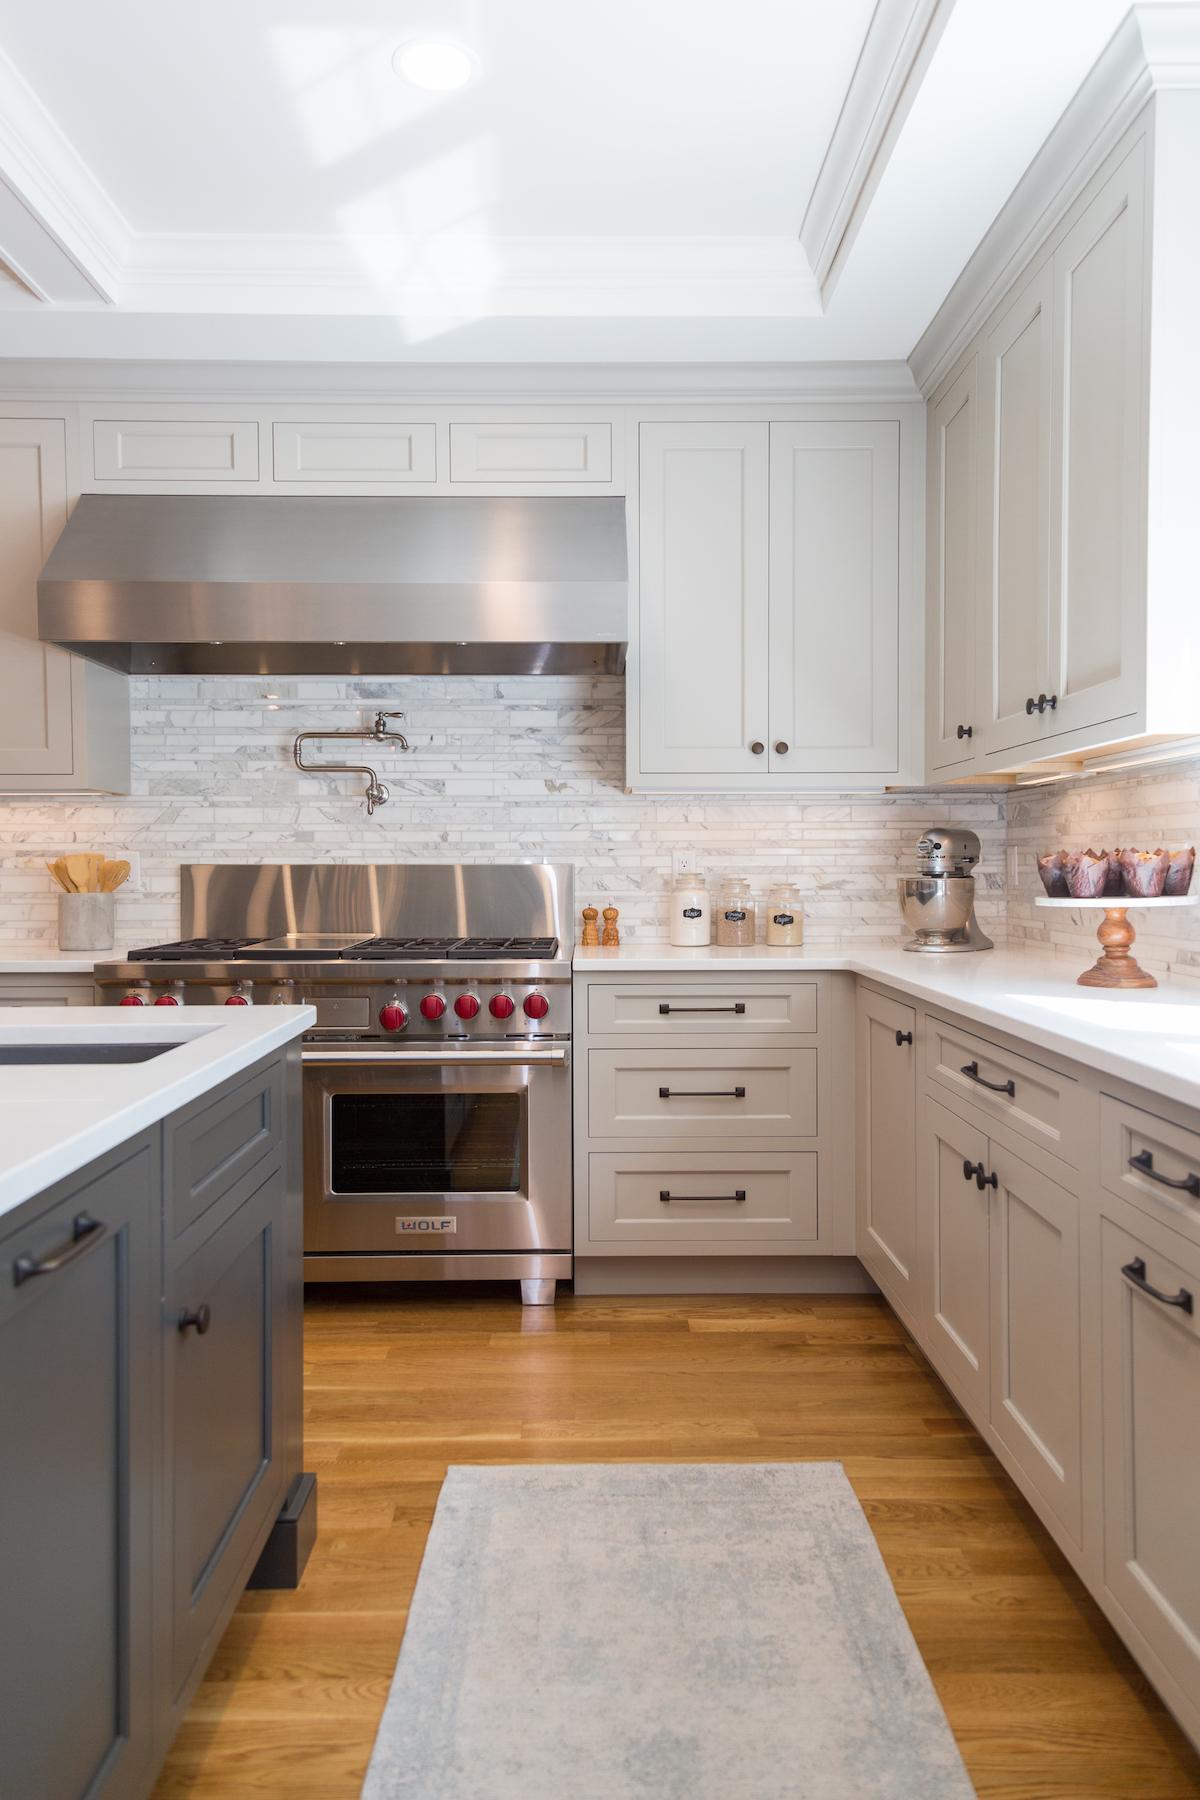 Kitchen Decor And Appliances